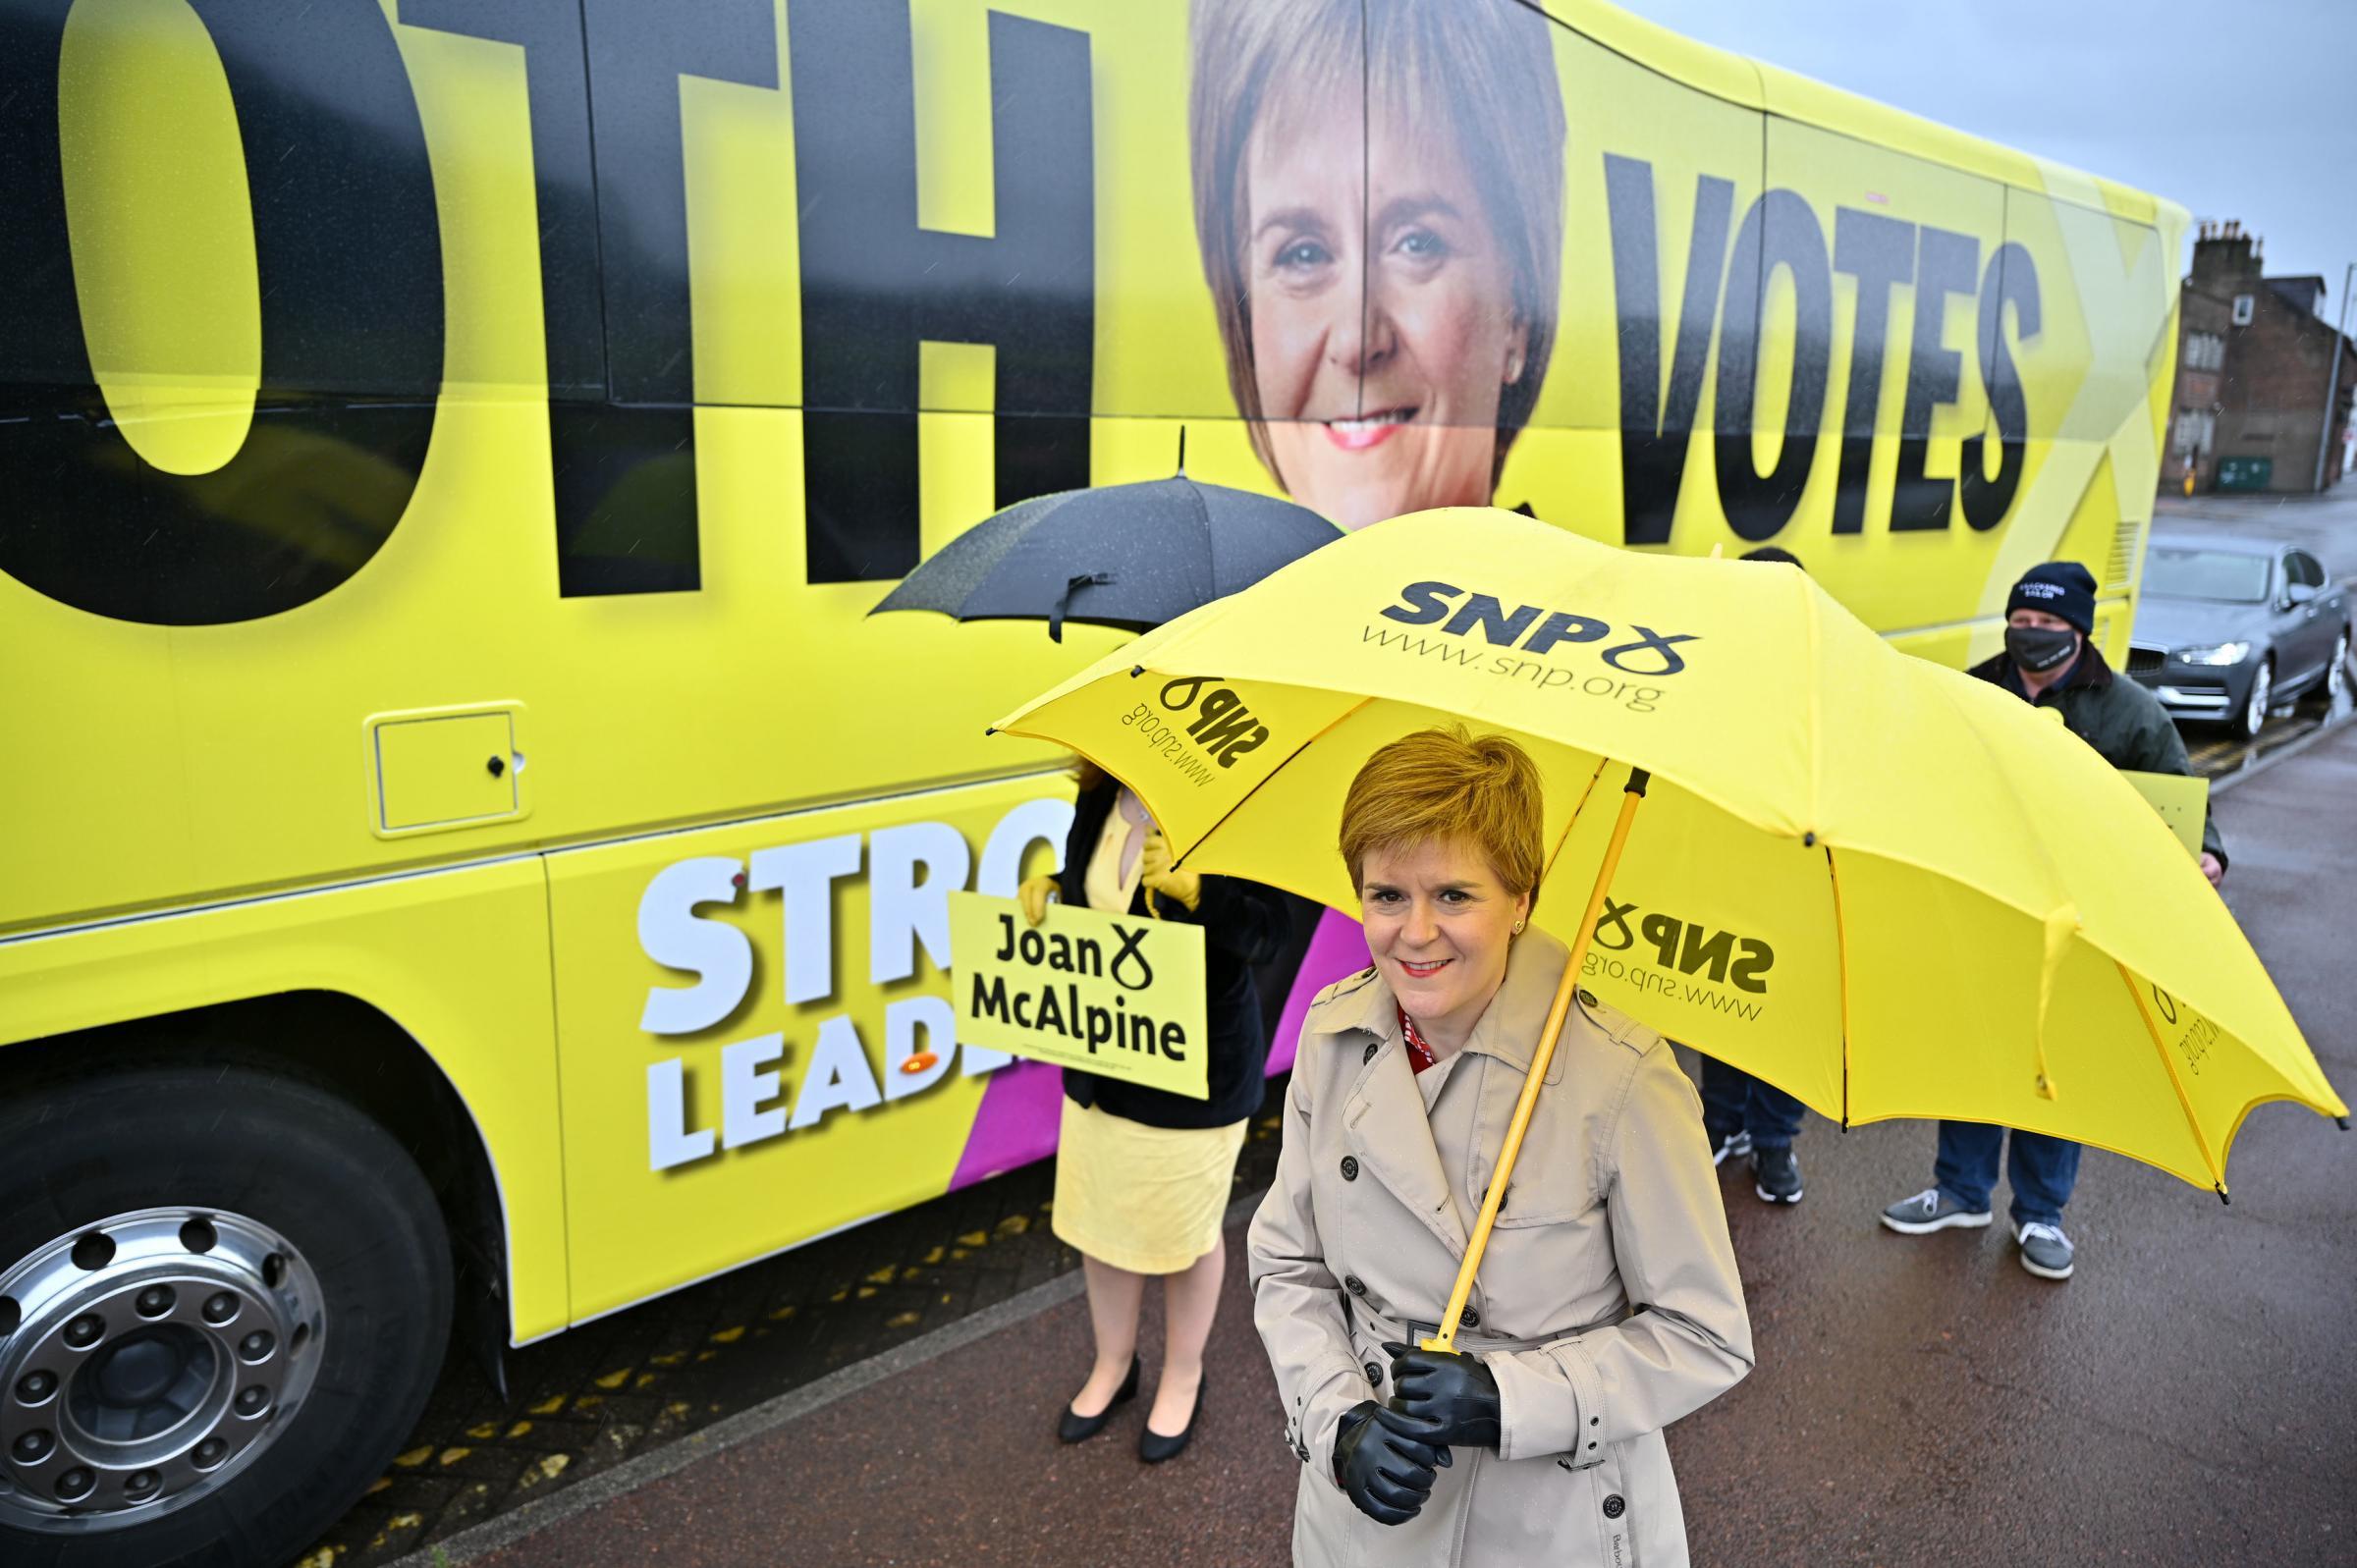 Nicola Sturgeon tells US magazine she felt close to 'broken' during Alex Salmond feud